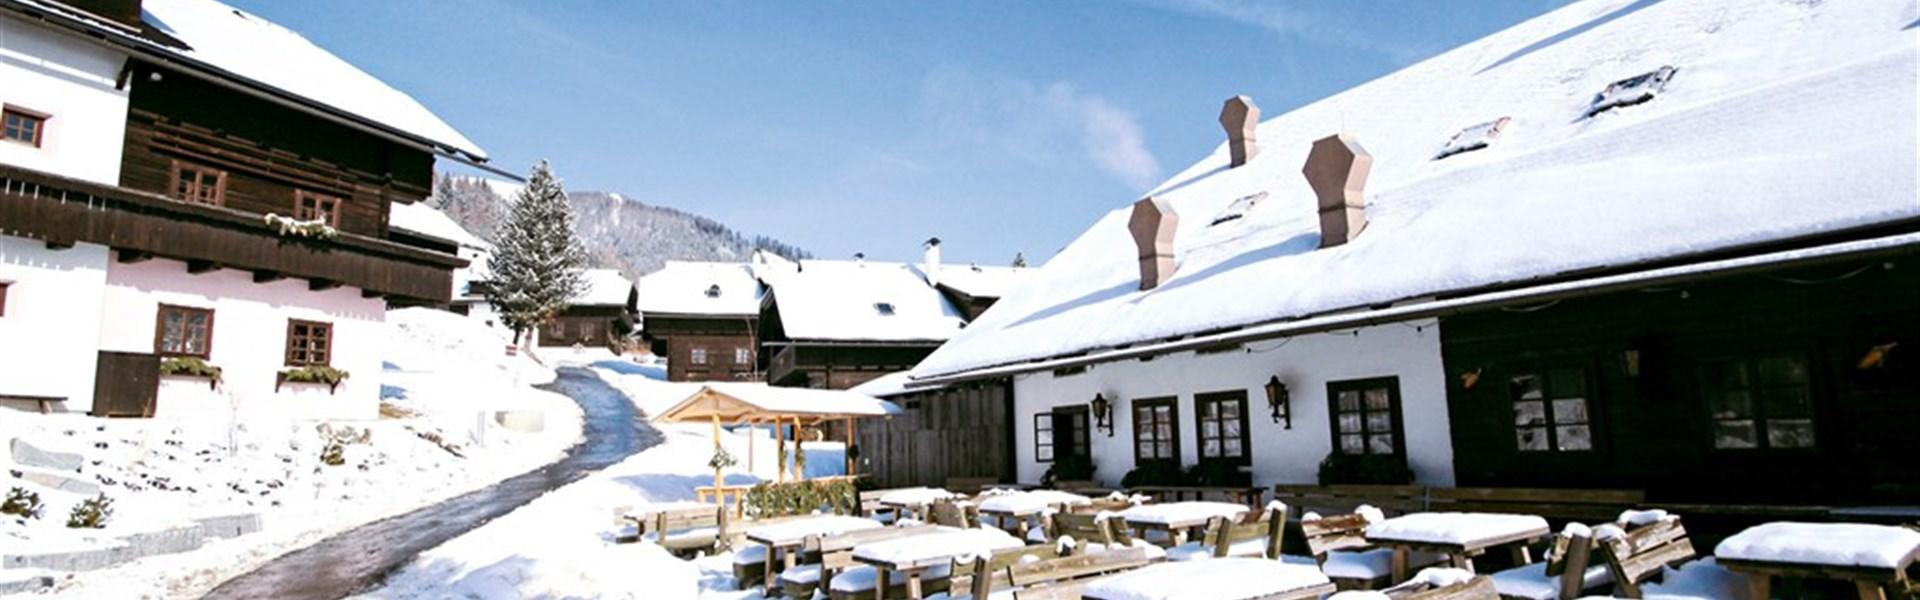 Marco Polo - Kirchleitn Dorf Grosswild -